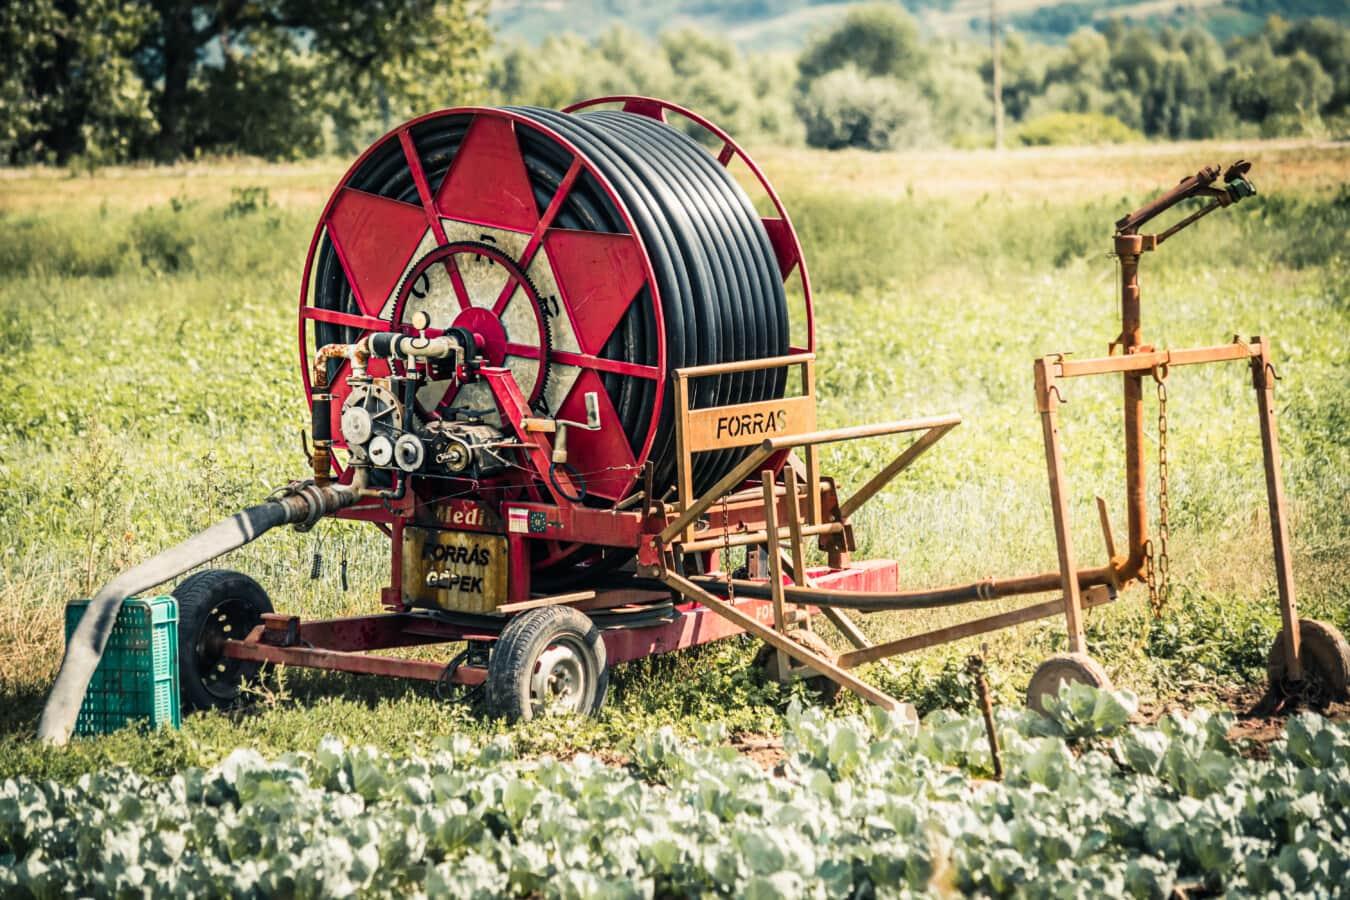 Bewässerung, System, Arbeit vor Ort, Landwirtschaft, Engine, Wasserpumpe, Bewässerung, Pumpe, Gerät, Maschine